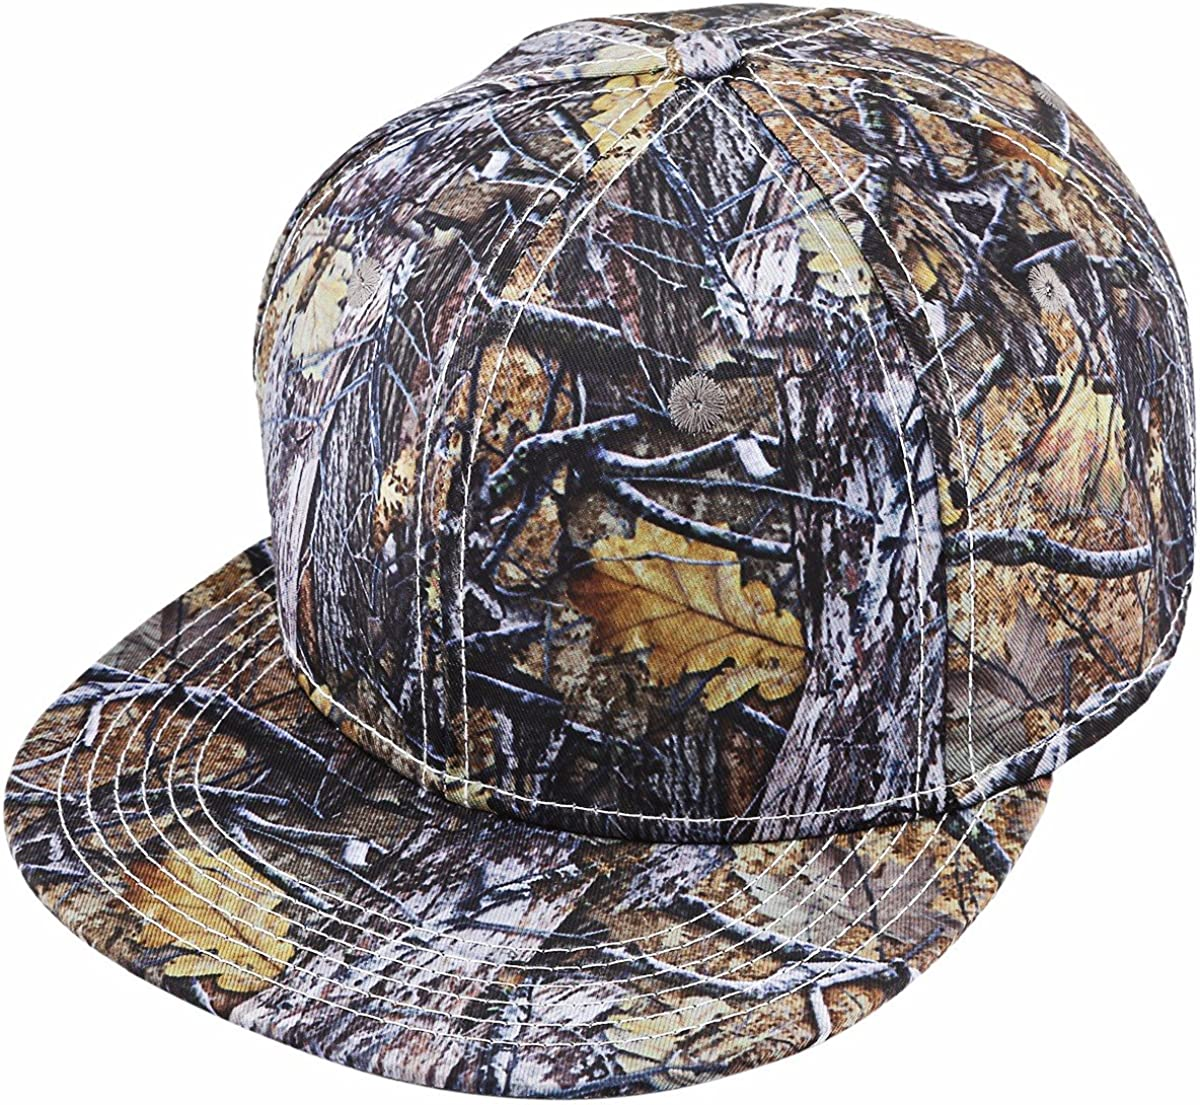 Samtree Unisex Snapback Hat,3D Camo Leaves Printed Outdoor Hunting Flat Brim Baseball Cap